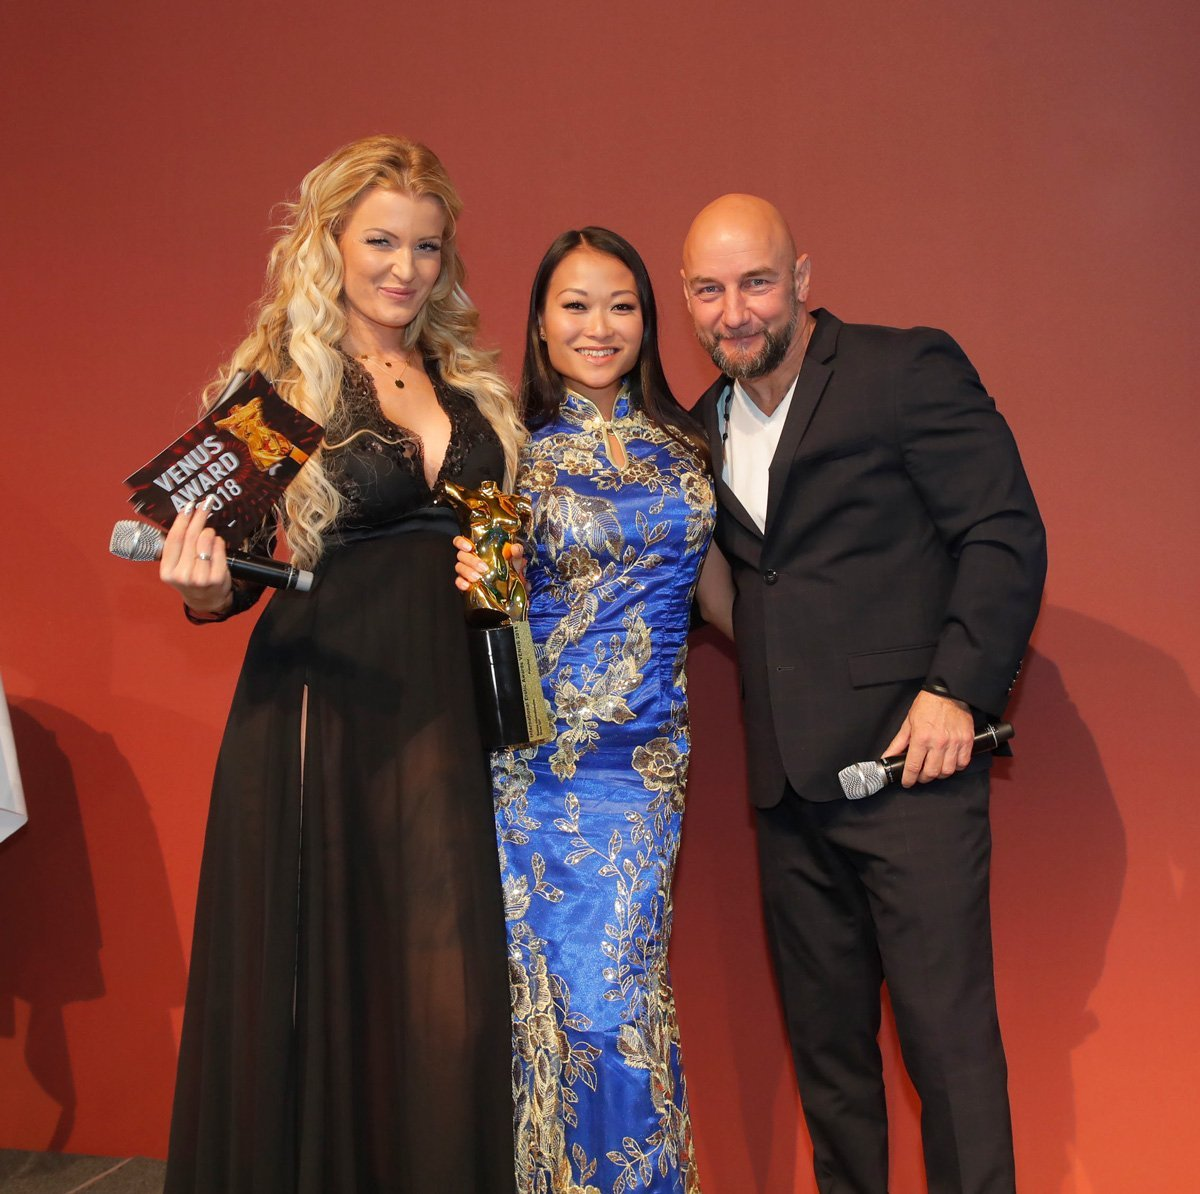 2018 VENUS Awards: Lifetime Achievement Award for Stormy